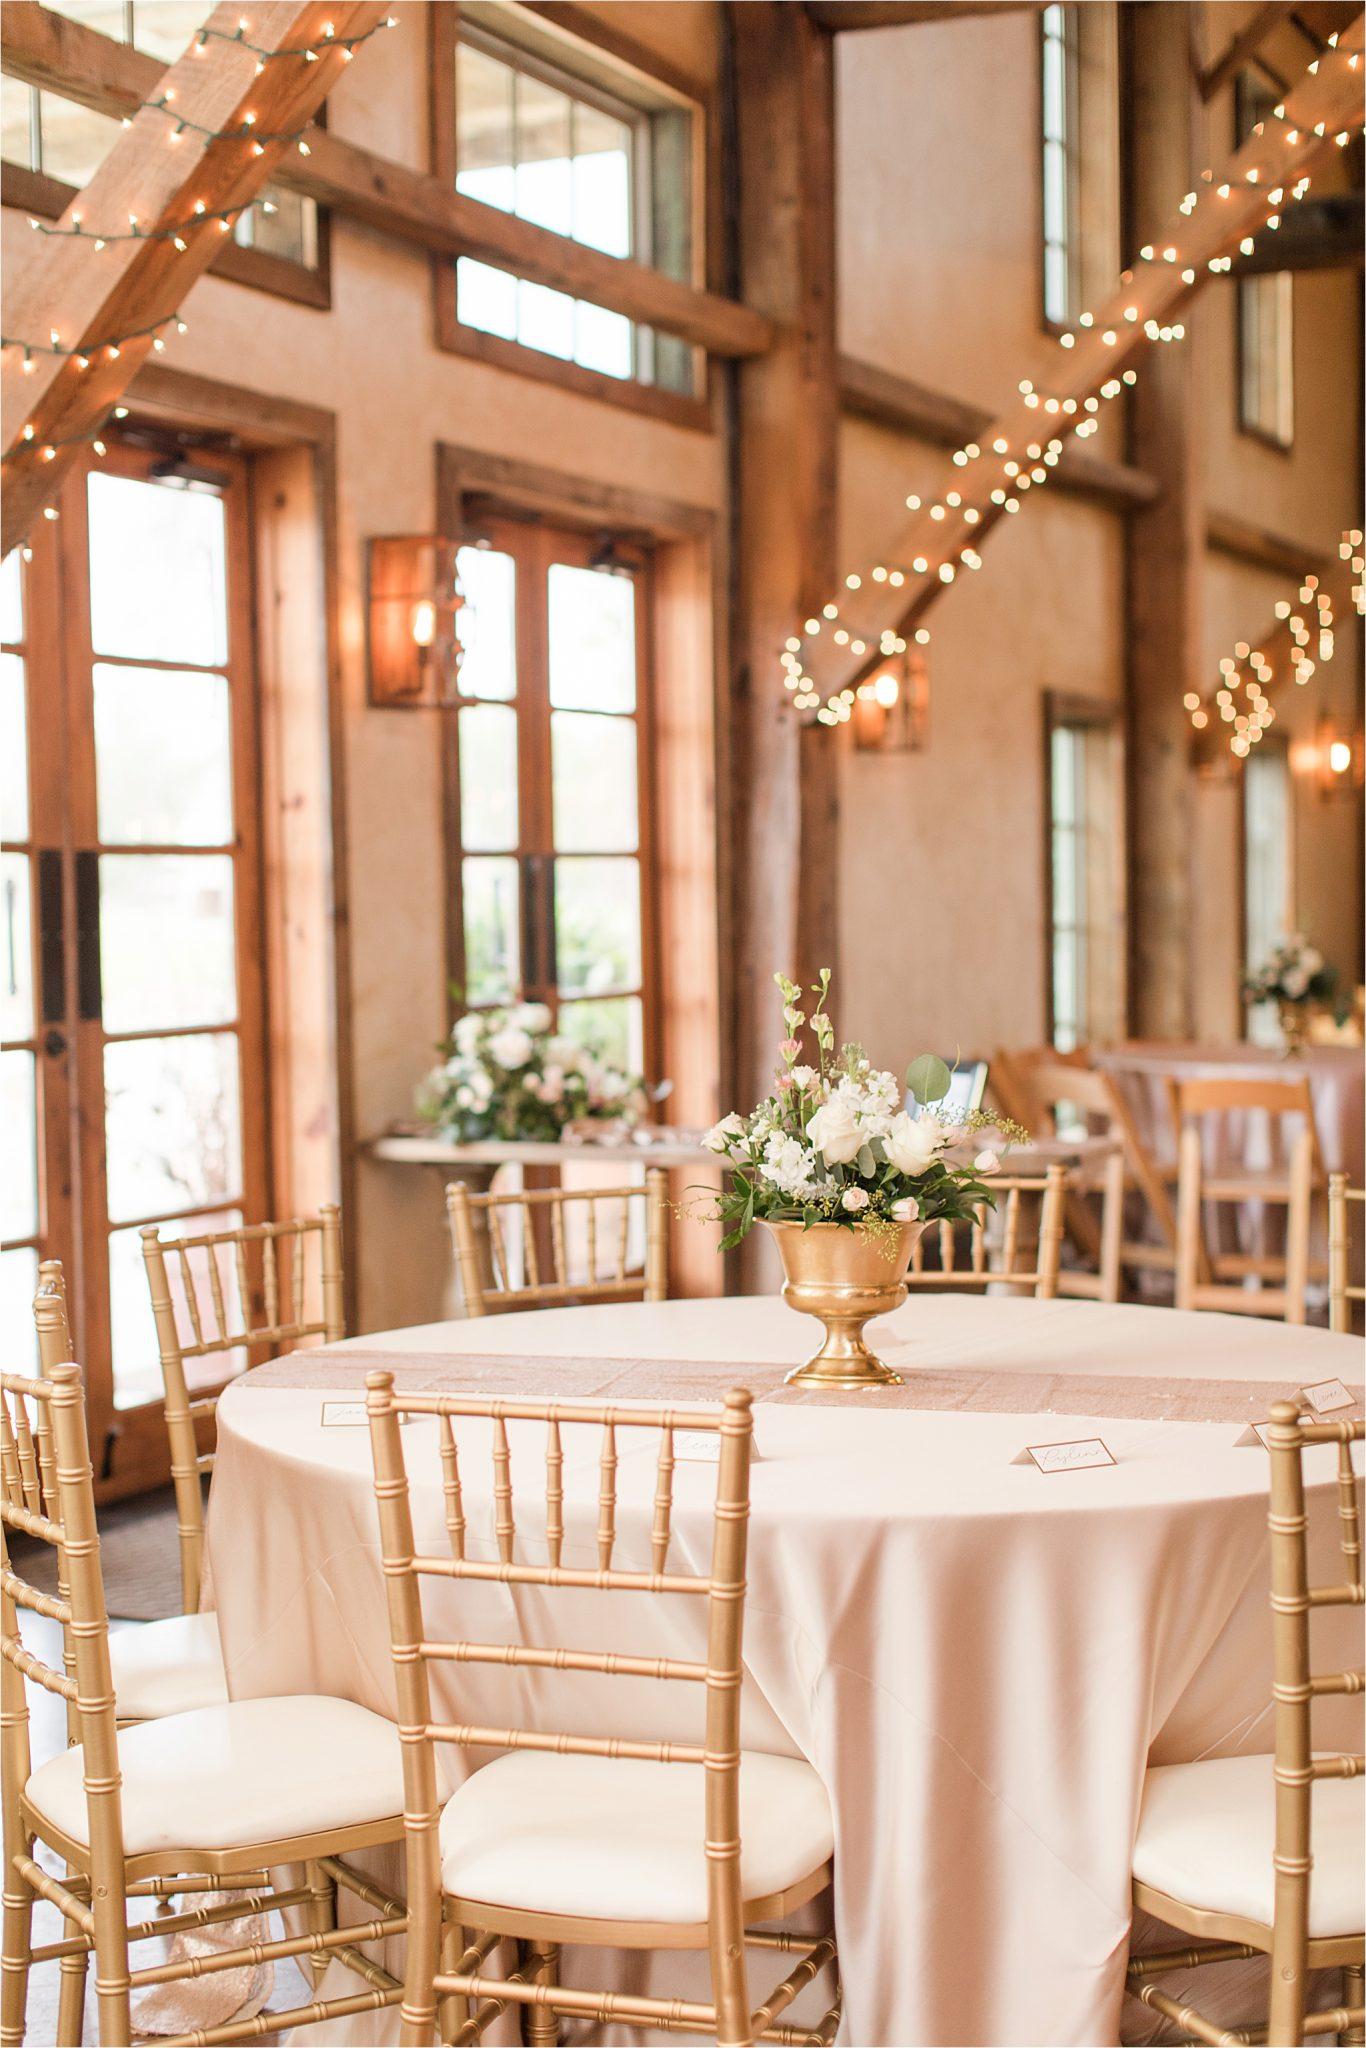 The Barn at Bridlewood Wedding-Hattiesburg, Mississippi-Kelsey + Blake-Wedding details-Barn wedding-Ruby wedding-Autumn themed wedding-Wedding detail-Wedding reception